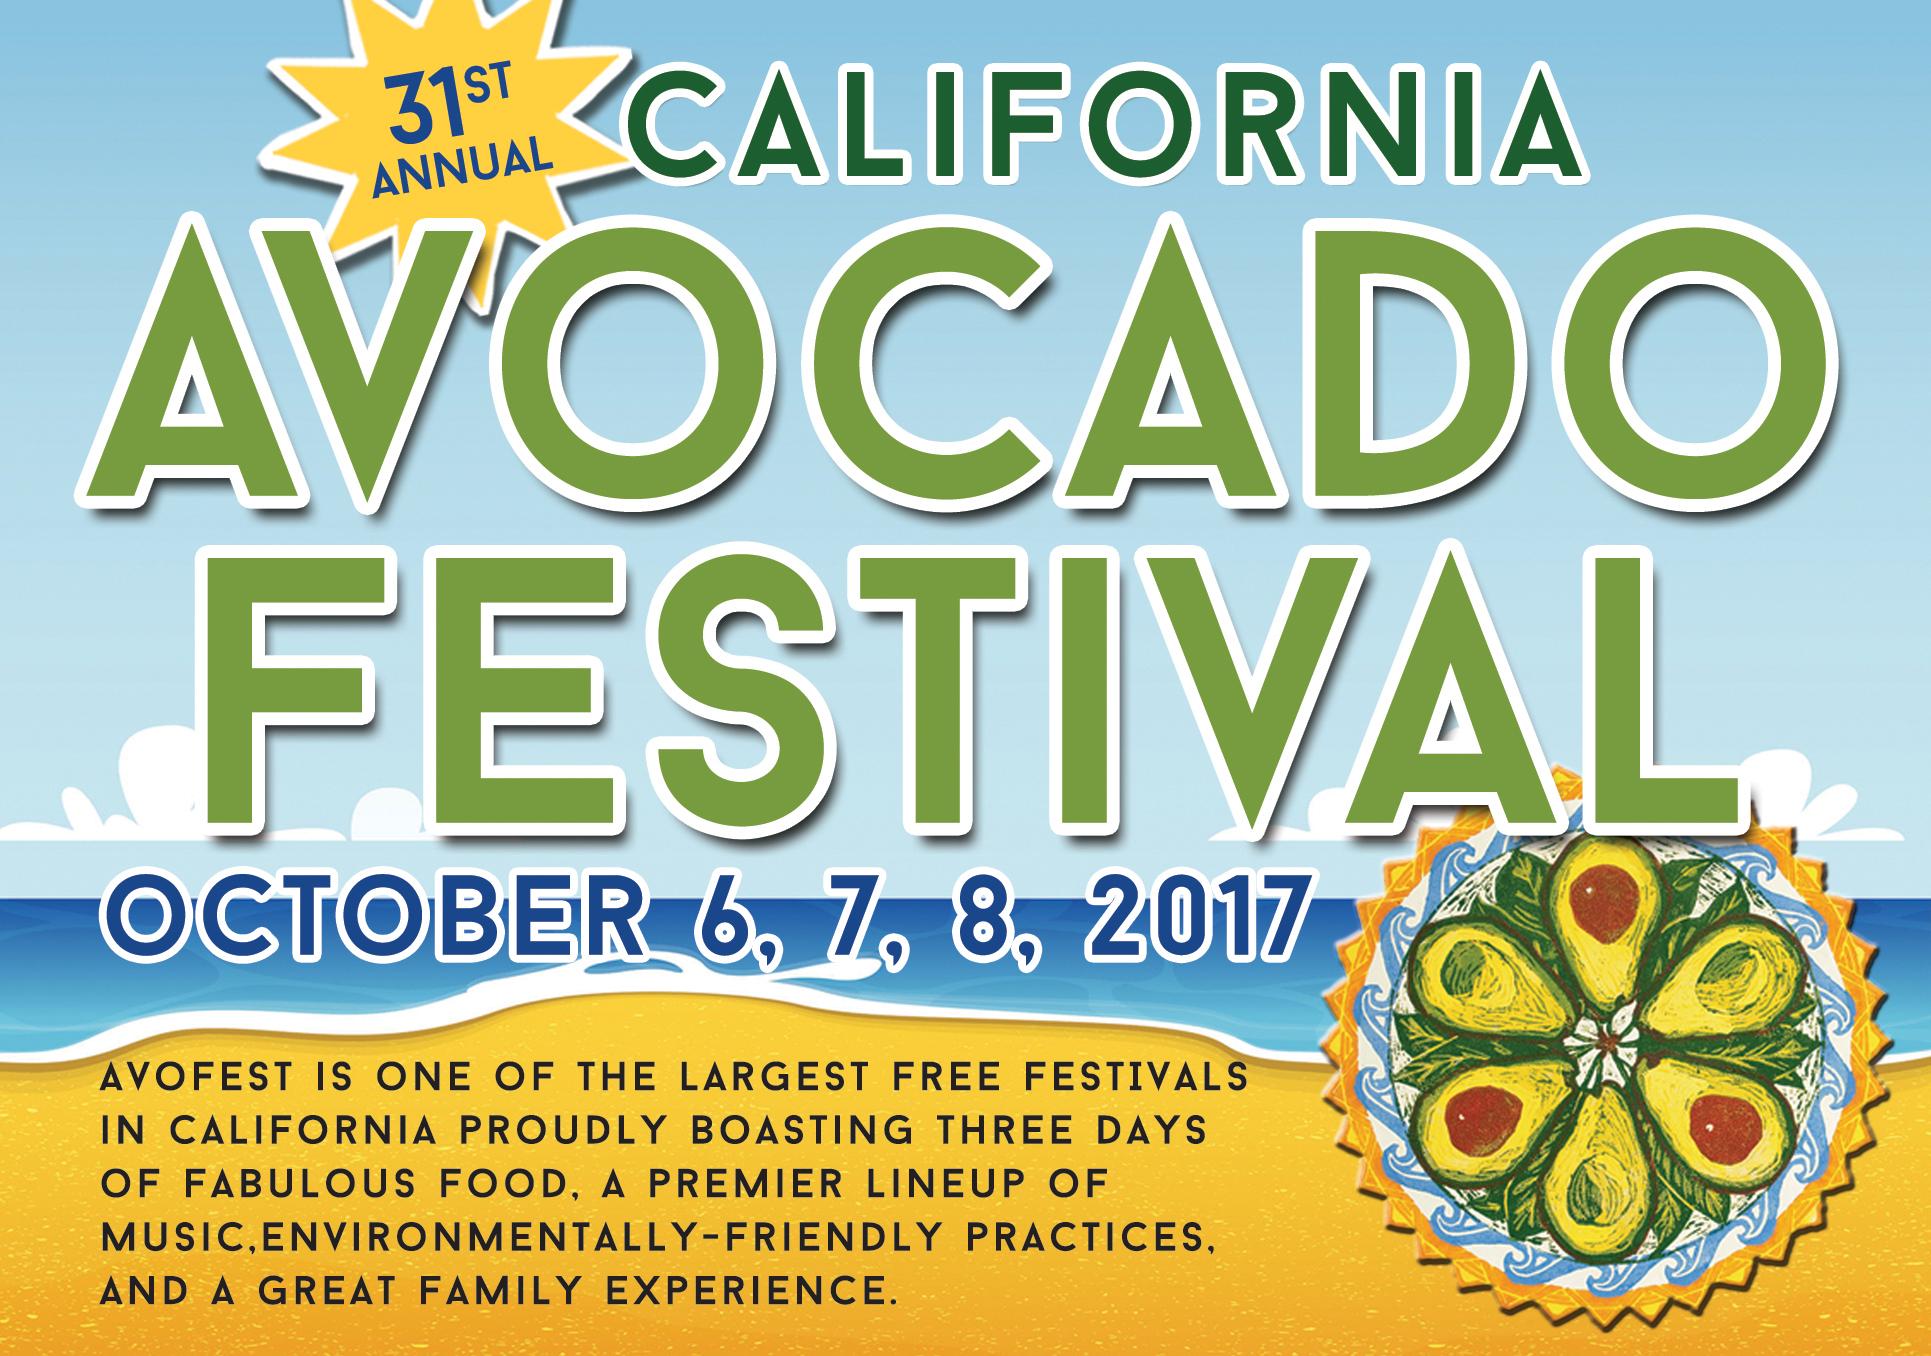 Avocado festival Bazaar